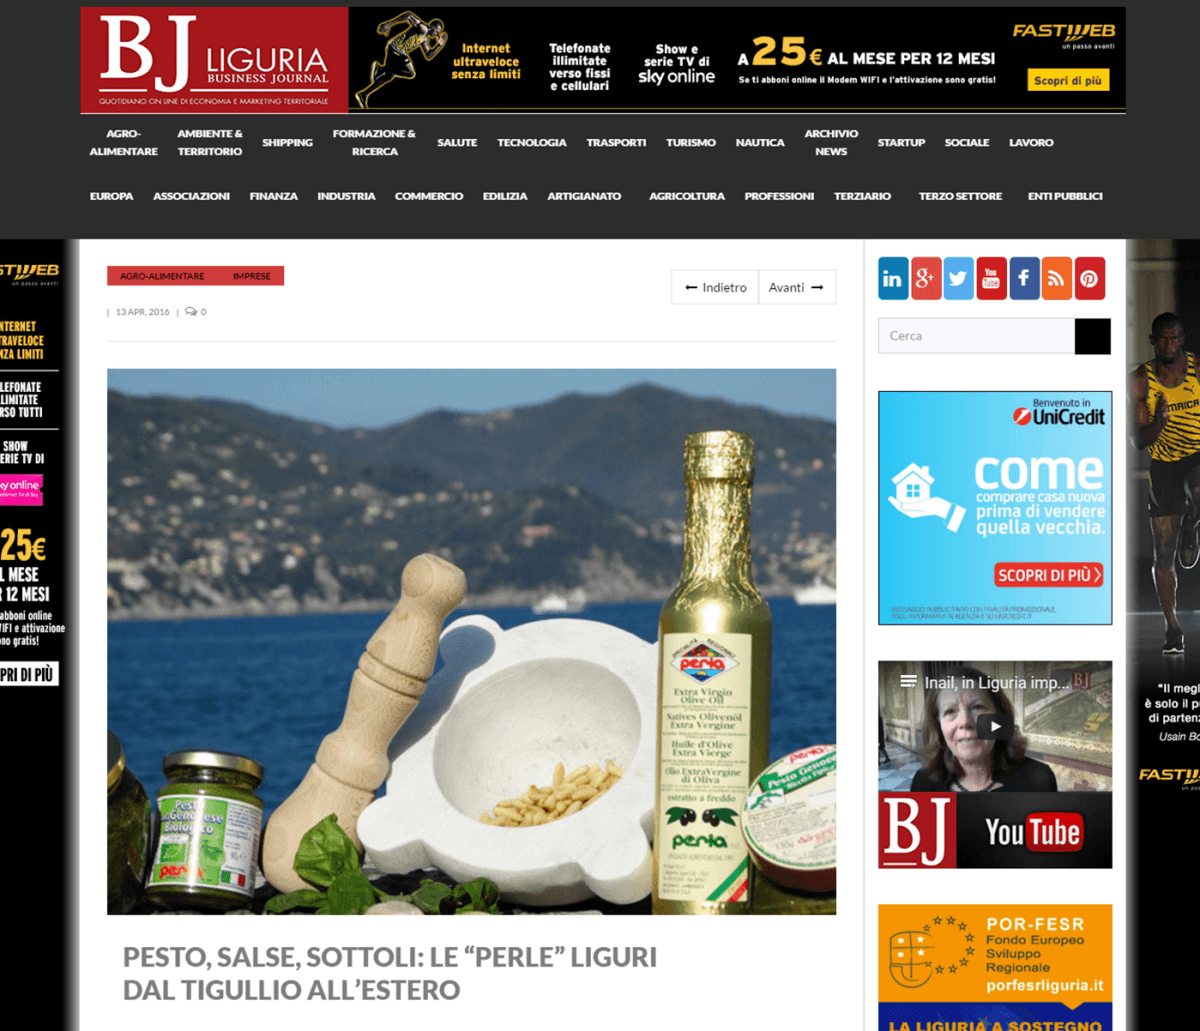 Bj Liguria 13 Aprile 2016